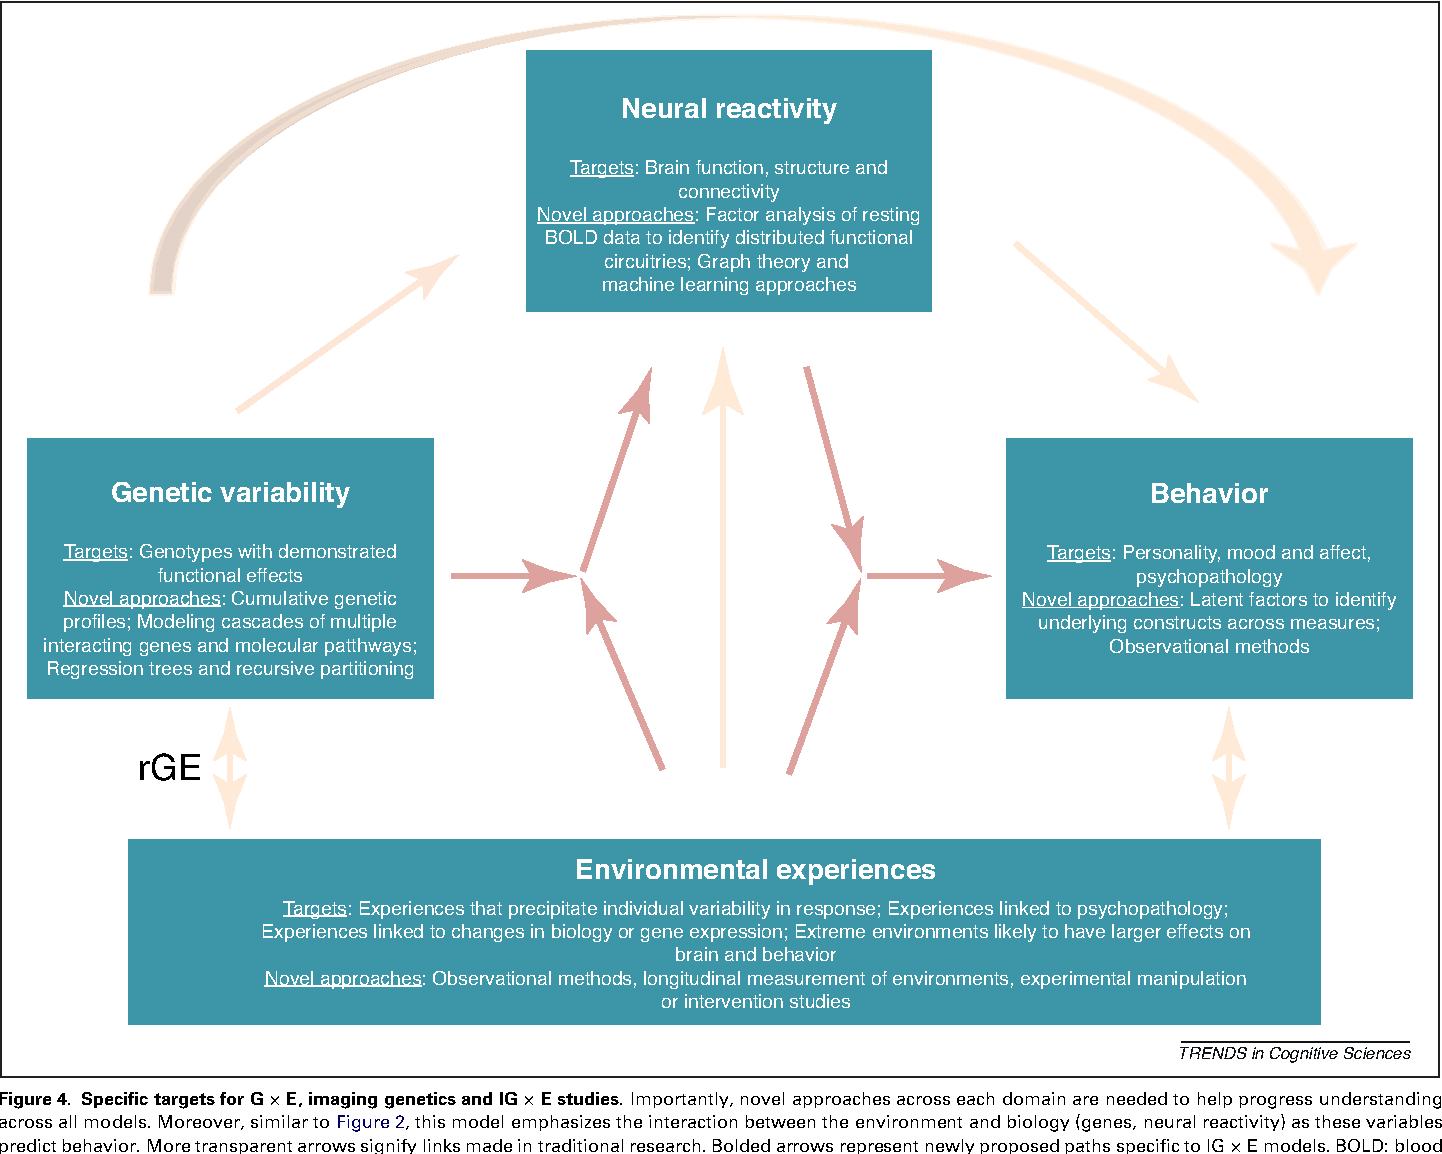 Gene Environment Interaction >> Figure 4 From Understanding Risk For Psychopathology Through